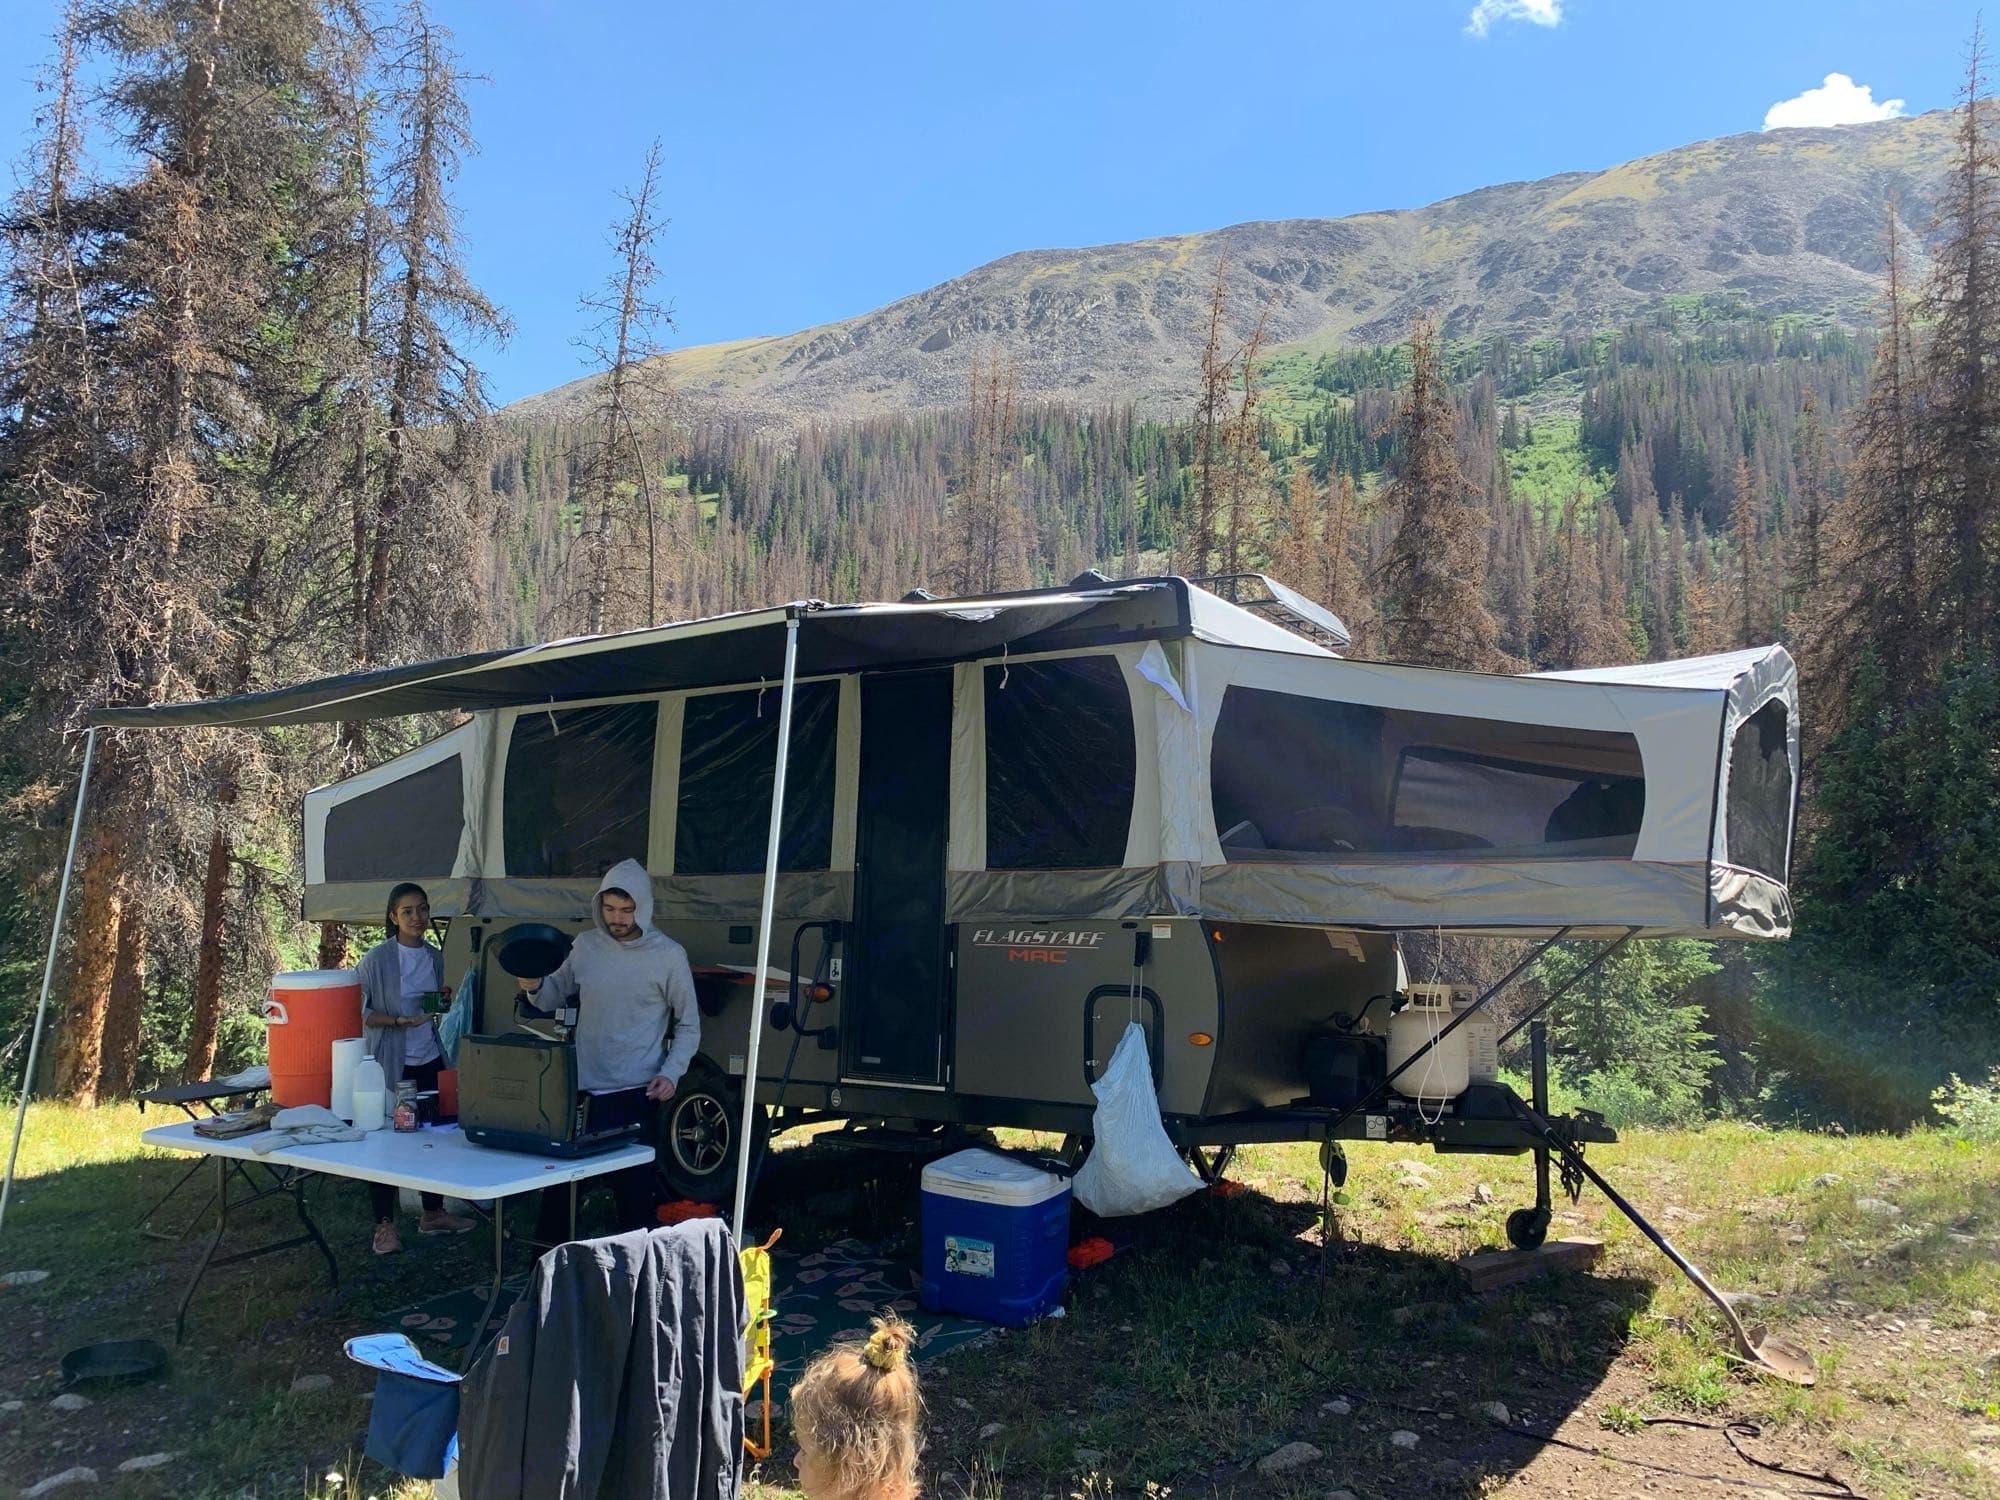 Boondocker setup at Hancock Ghost Town. Forest River Flagstaff 2020